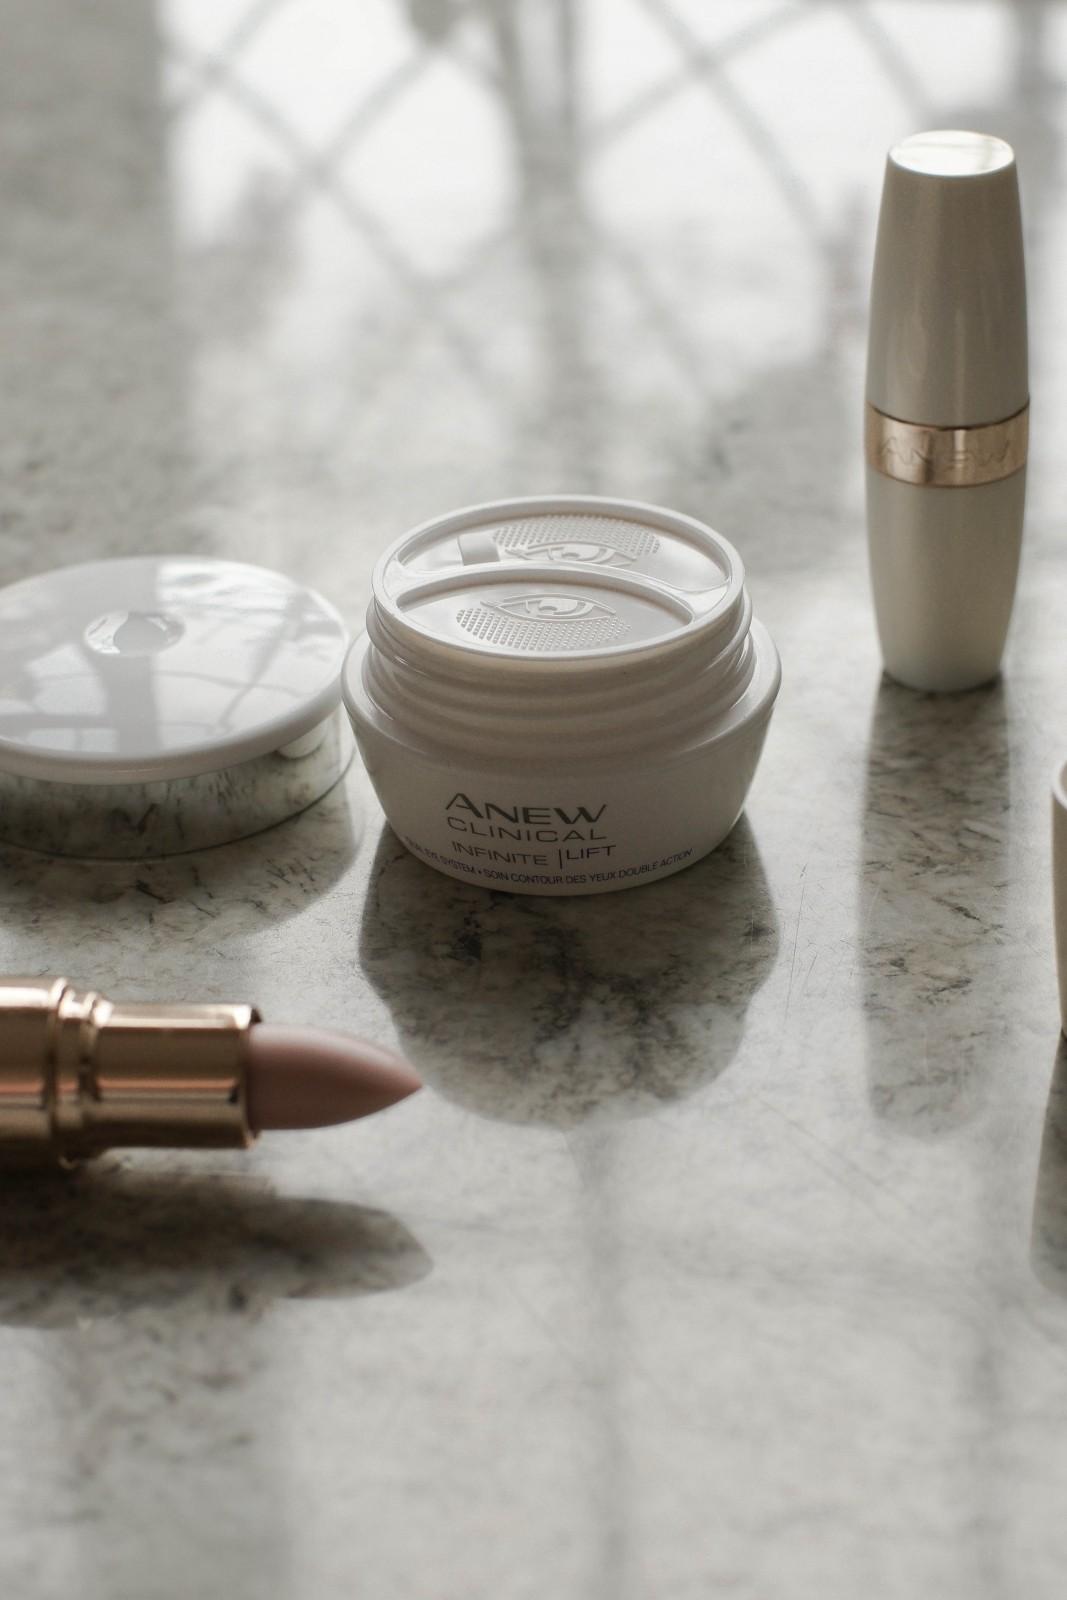 La Roche-Posay Effaclar Duo Plus & Avon Anew Products Review-4